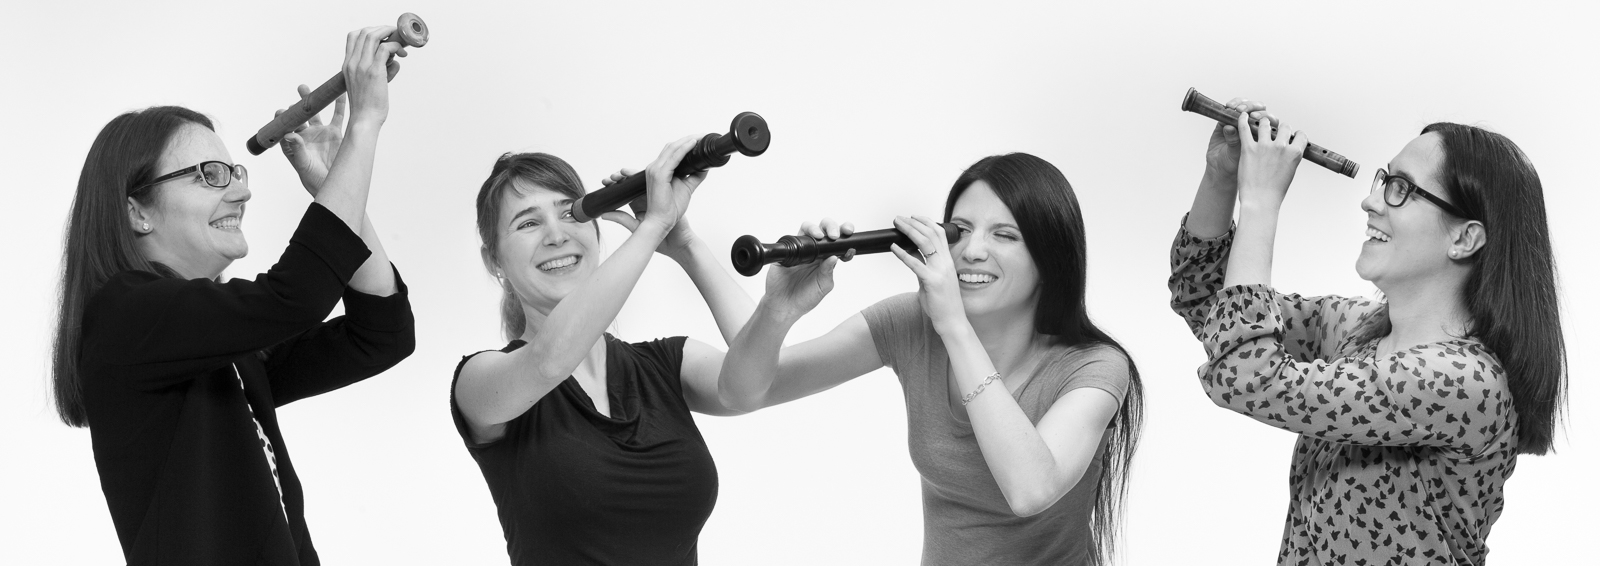 La Merula Quartett, Ensemble: Aline Arman, Maria Hänggi, Anja Margarita Kaufmann, Nicole Meule – Blockflöten